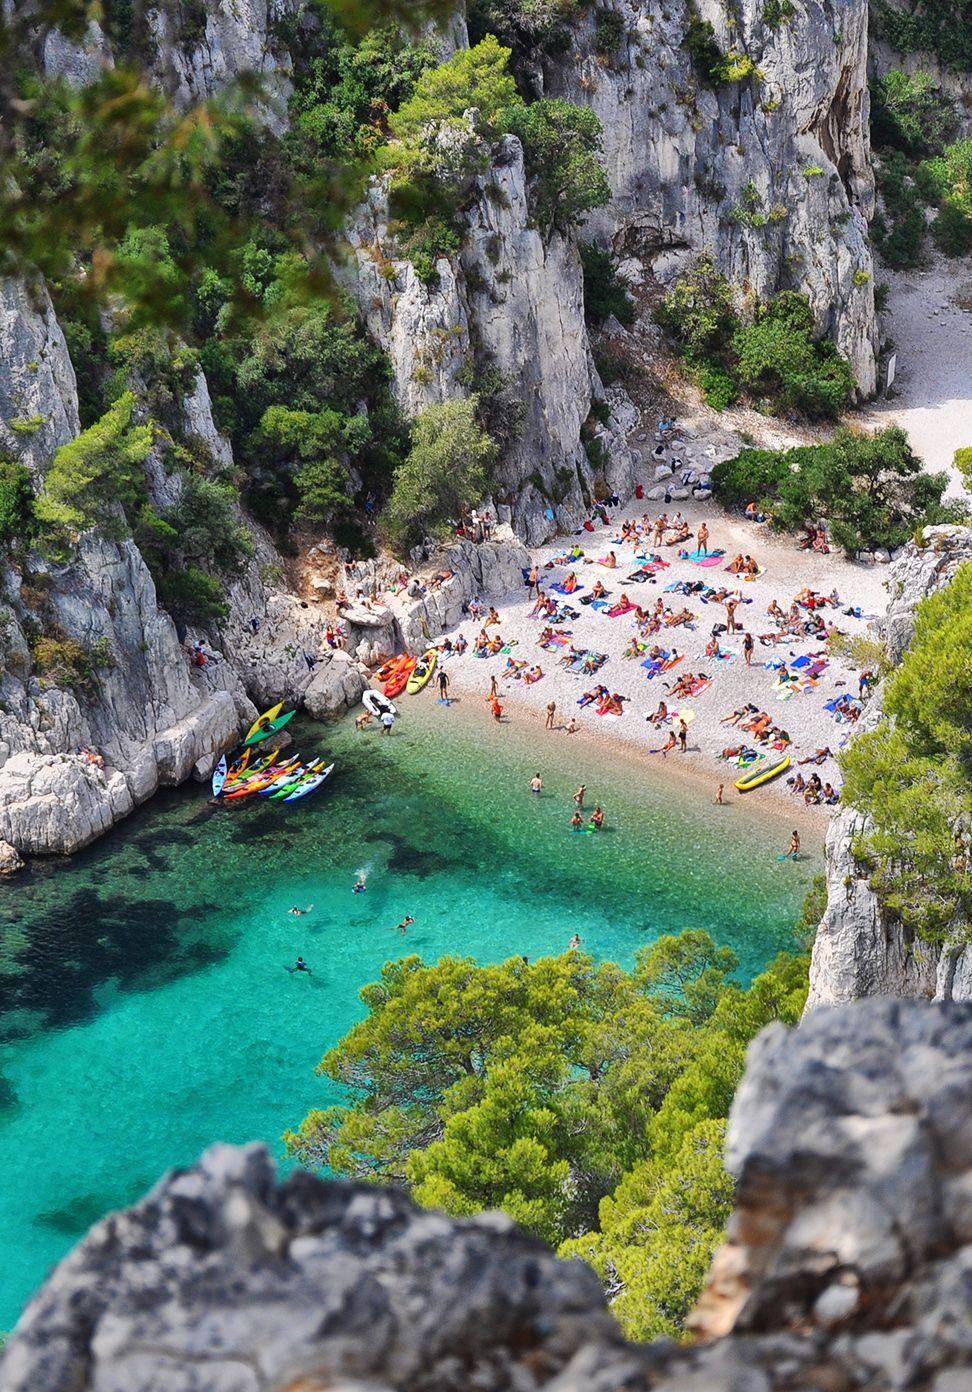 Calanque d'En-Vau, France,. Our article on 19 of the best European beaches: http://www.europealacarte.co.uk/blog/2011/03/28/best-beaches-europ: